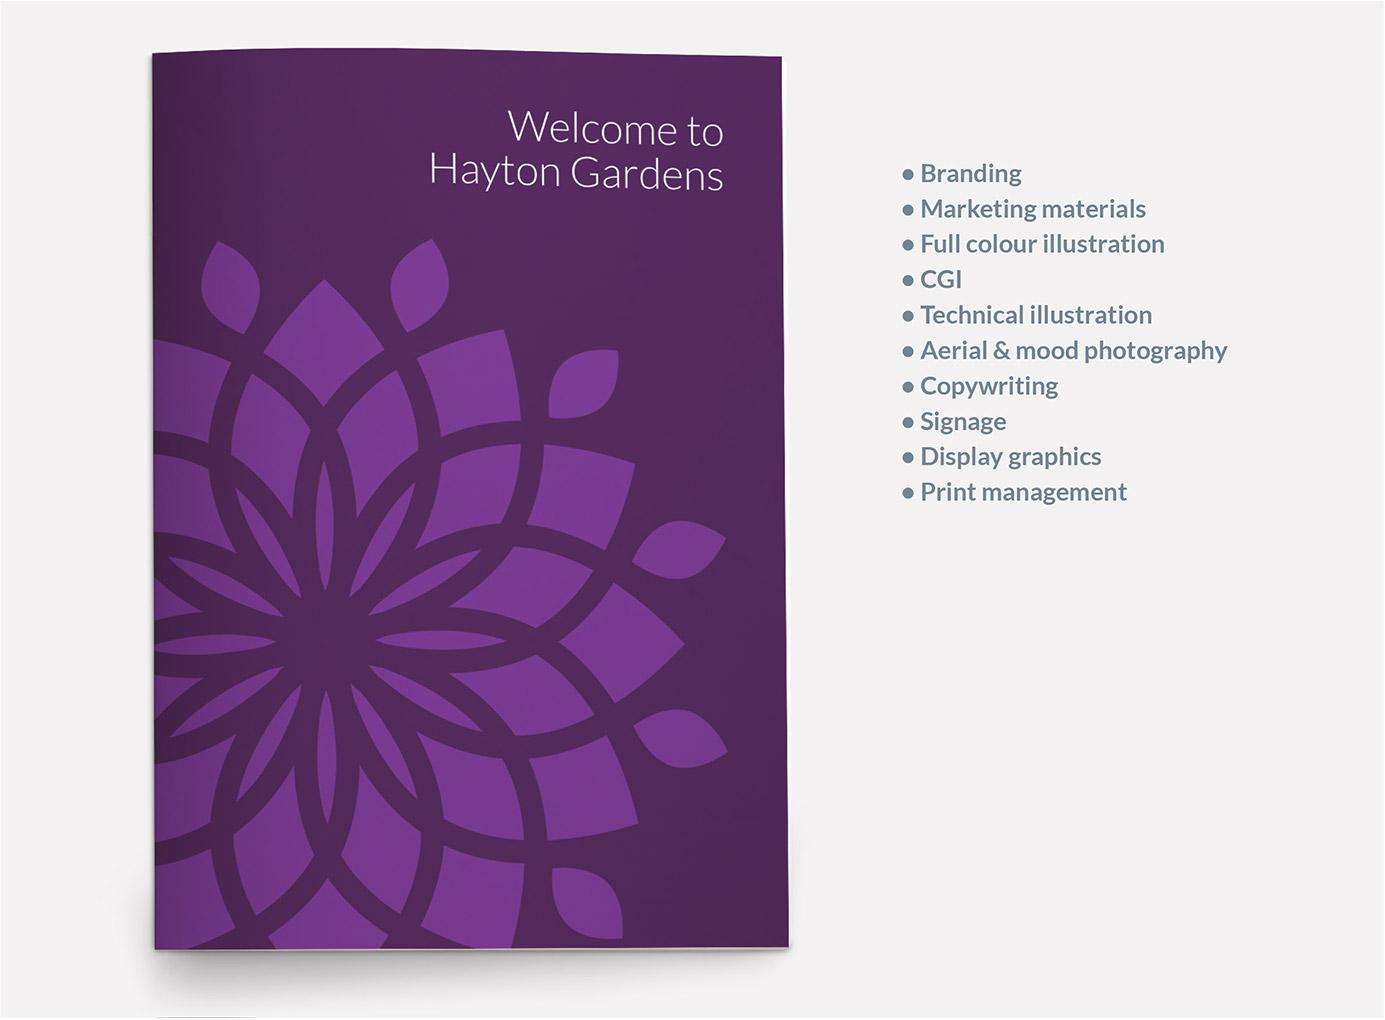 hayton-gardens-image1